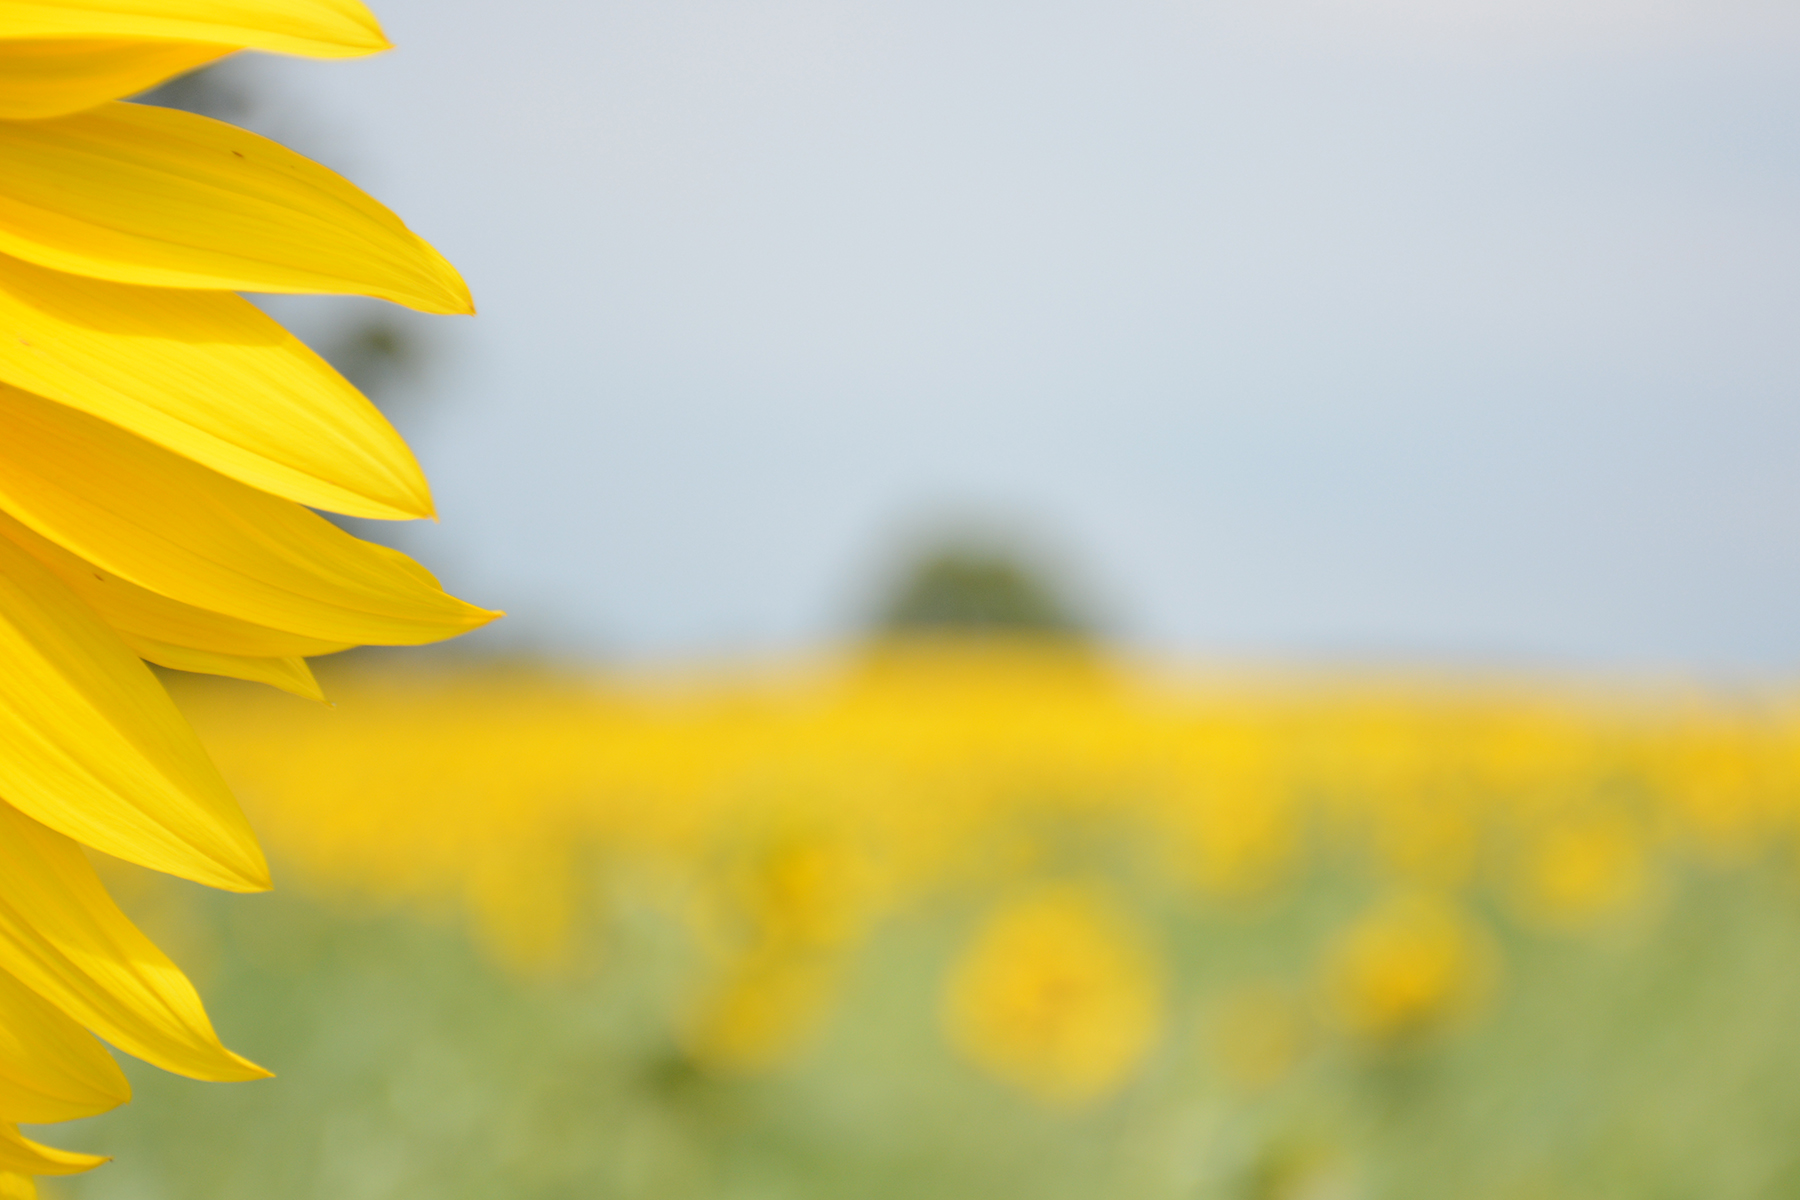 2015-08-07_Sunflower5